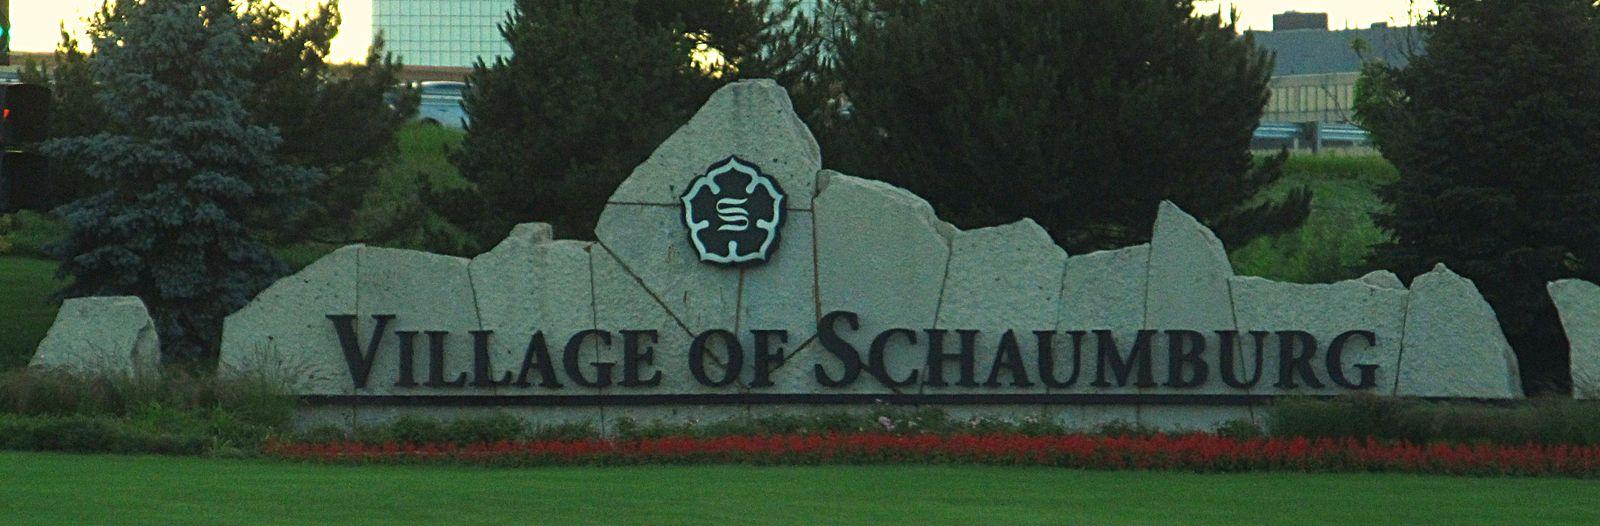 Schaumburg,_Illinois_welcome_sign